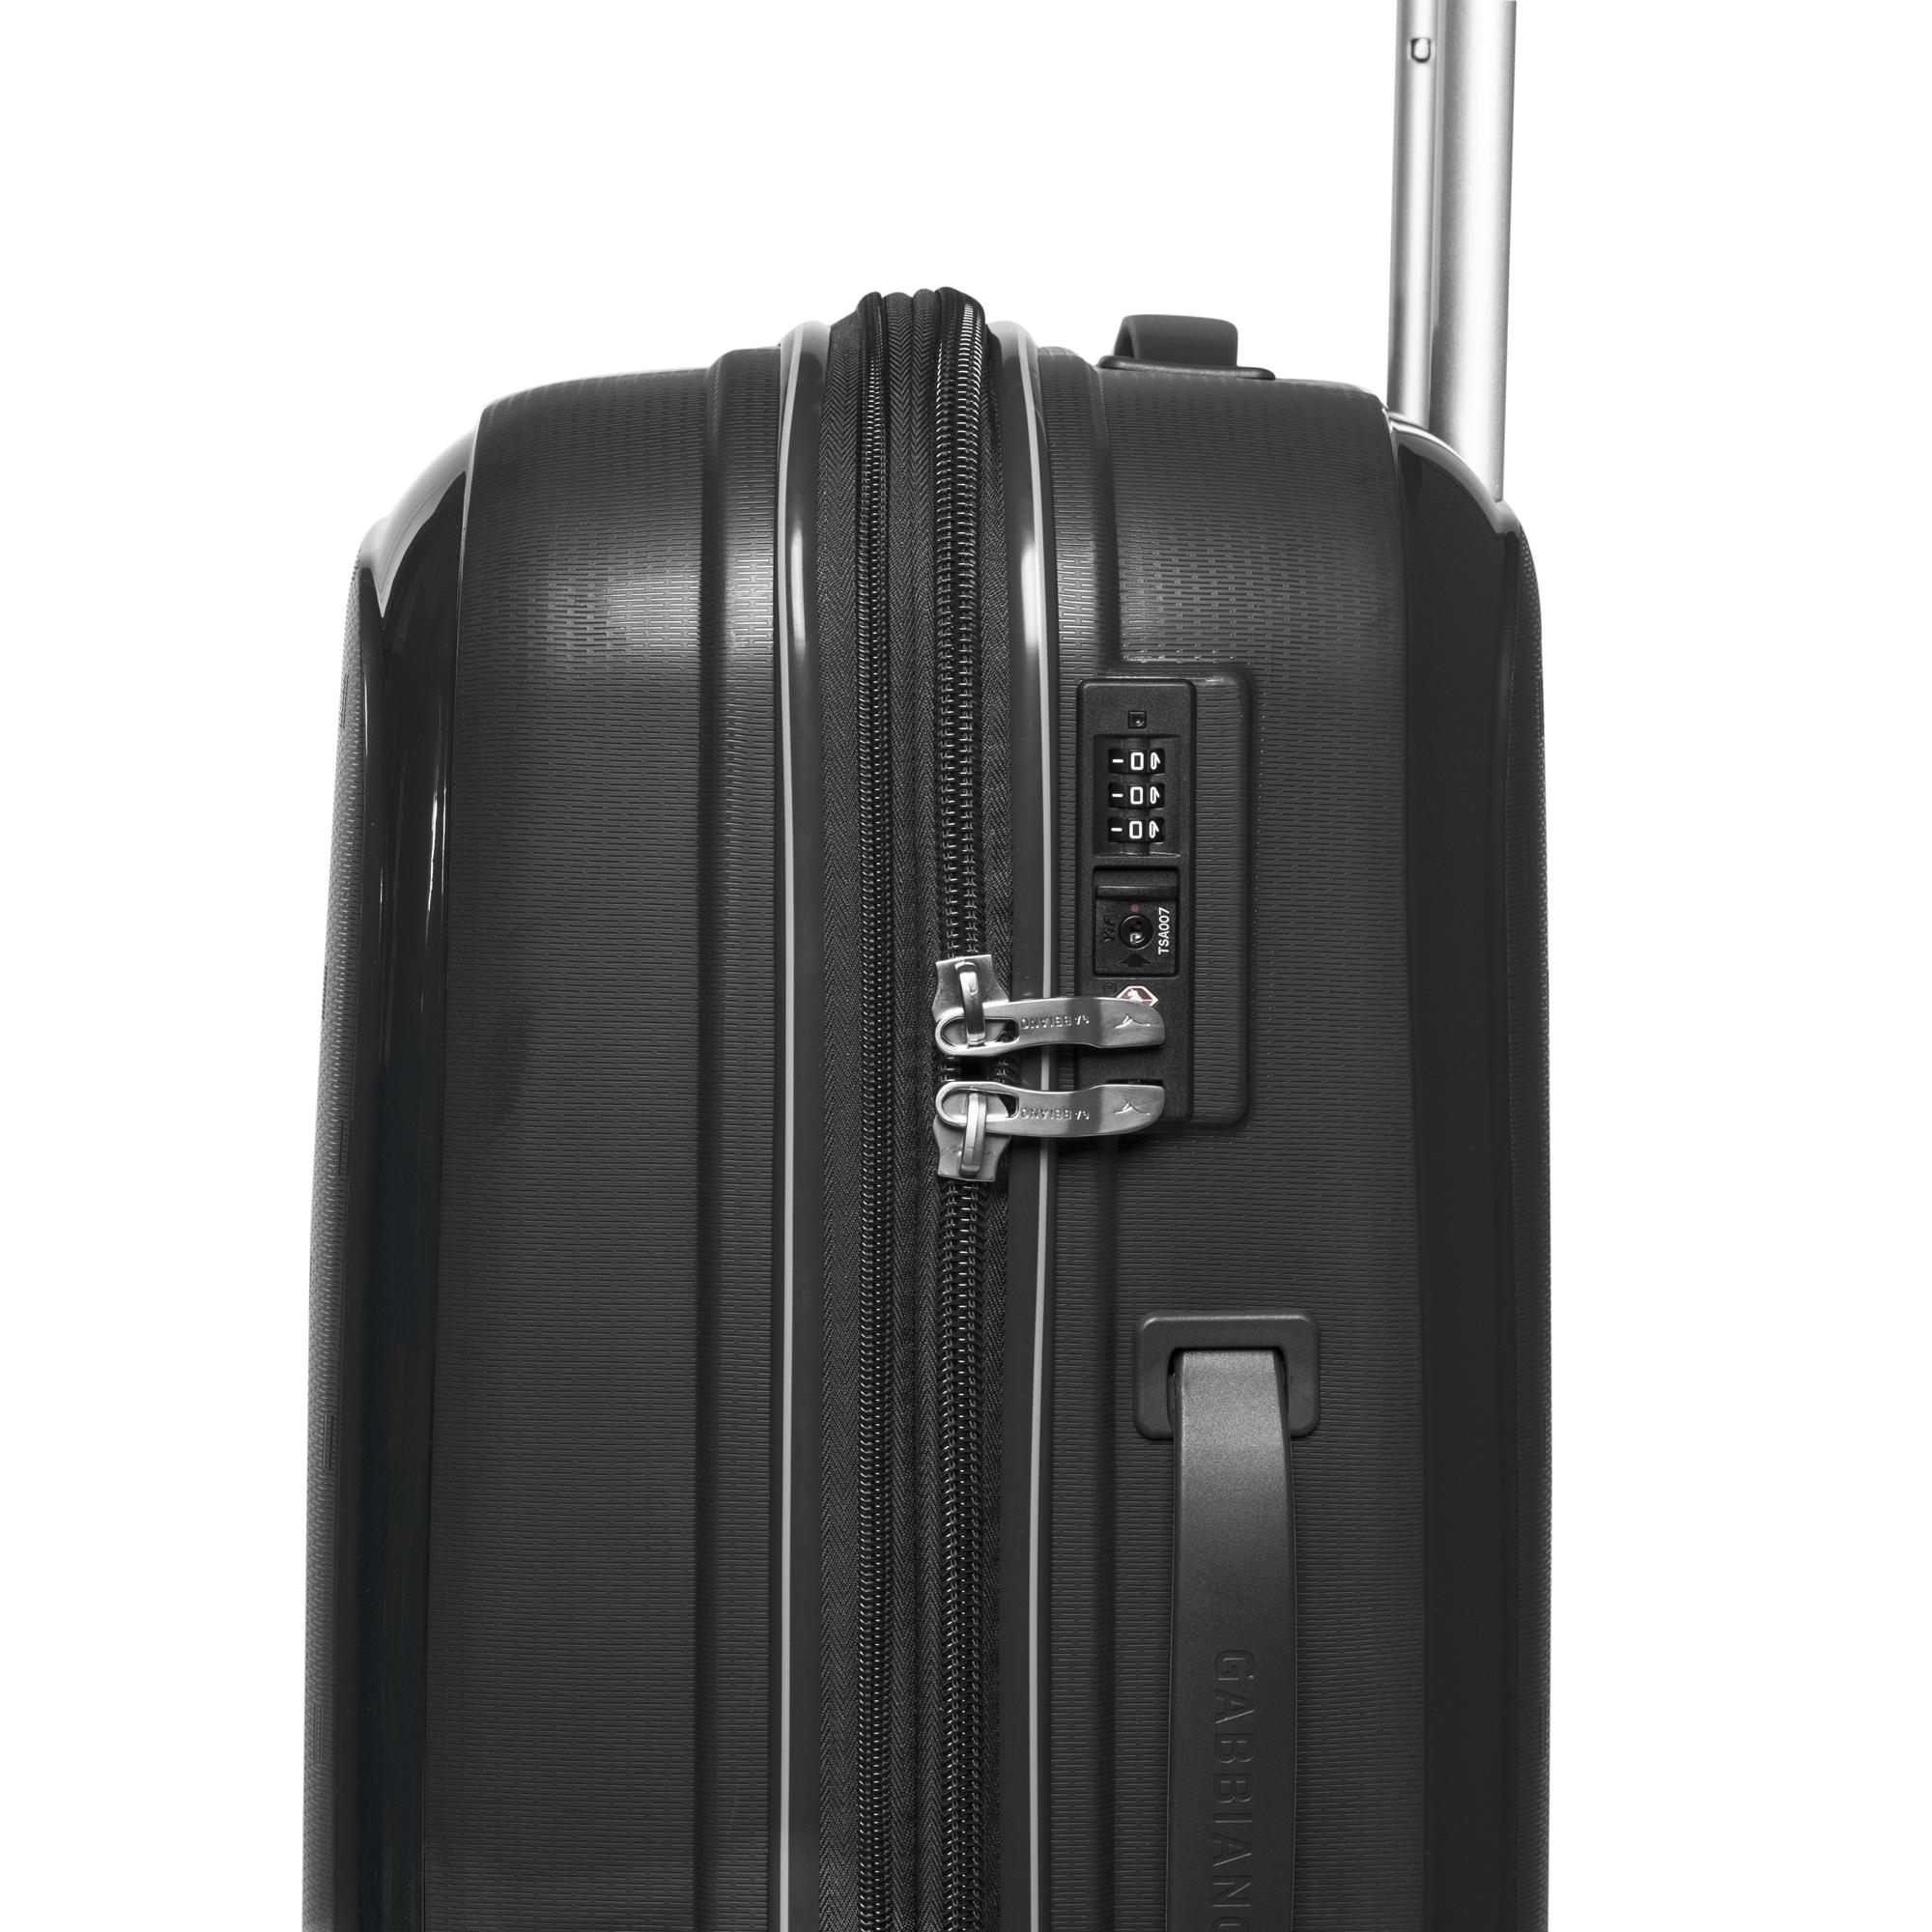 GA1150-lock-black-2k